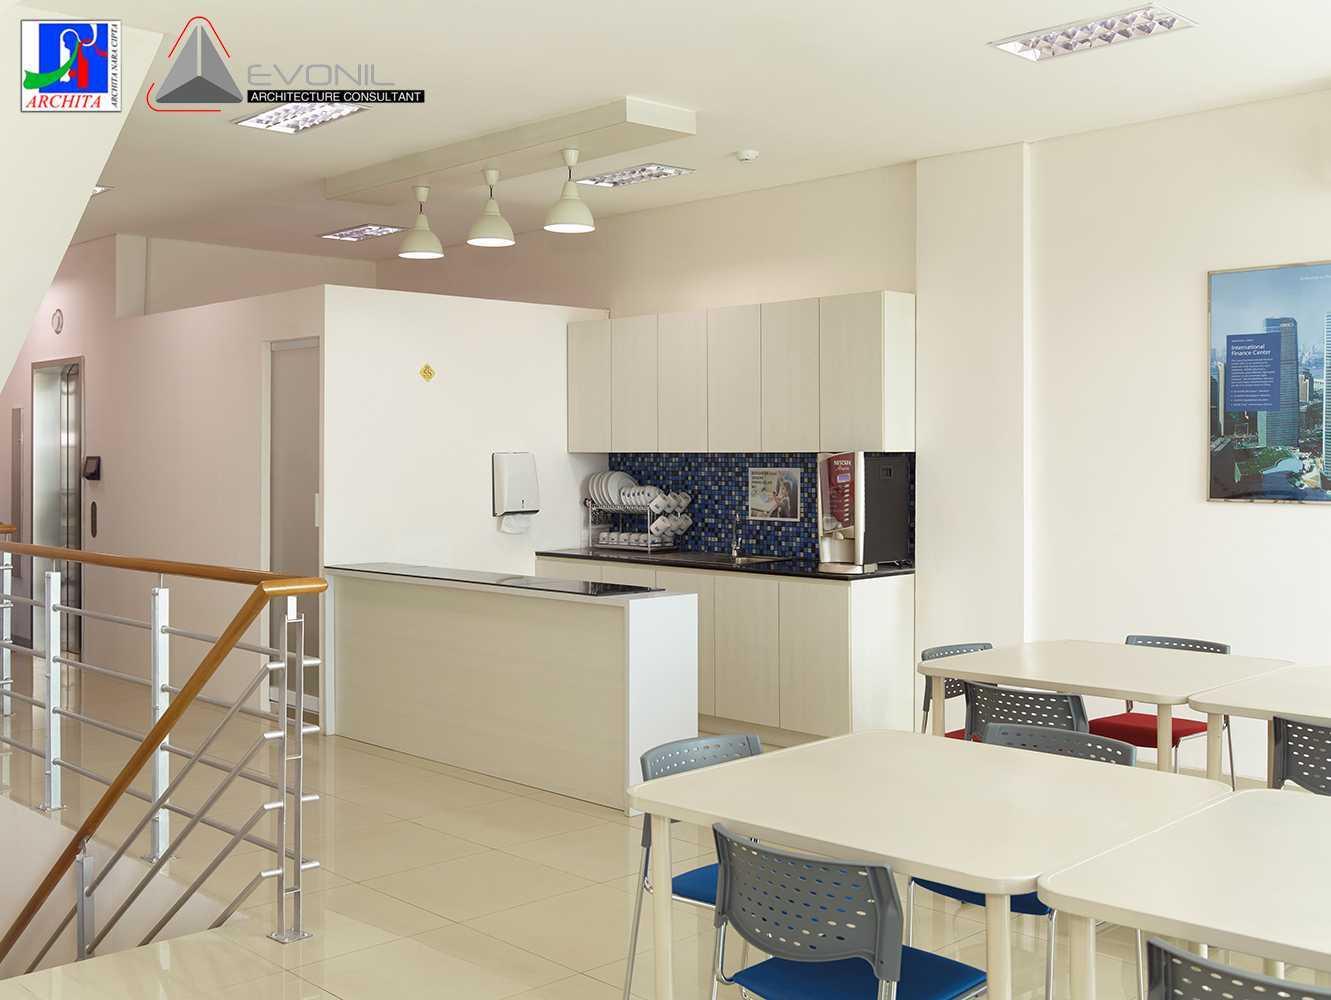 Foto inspirasi ide desain dapur minimalis Pantry oleh Evonil Architecture di Arsitag